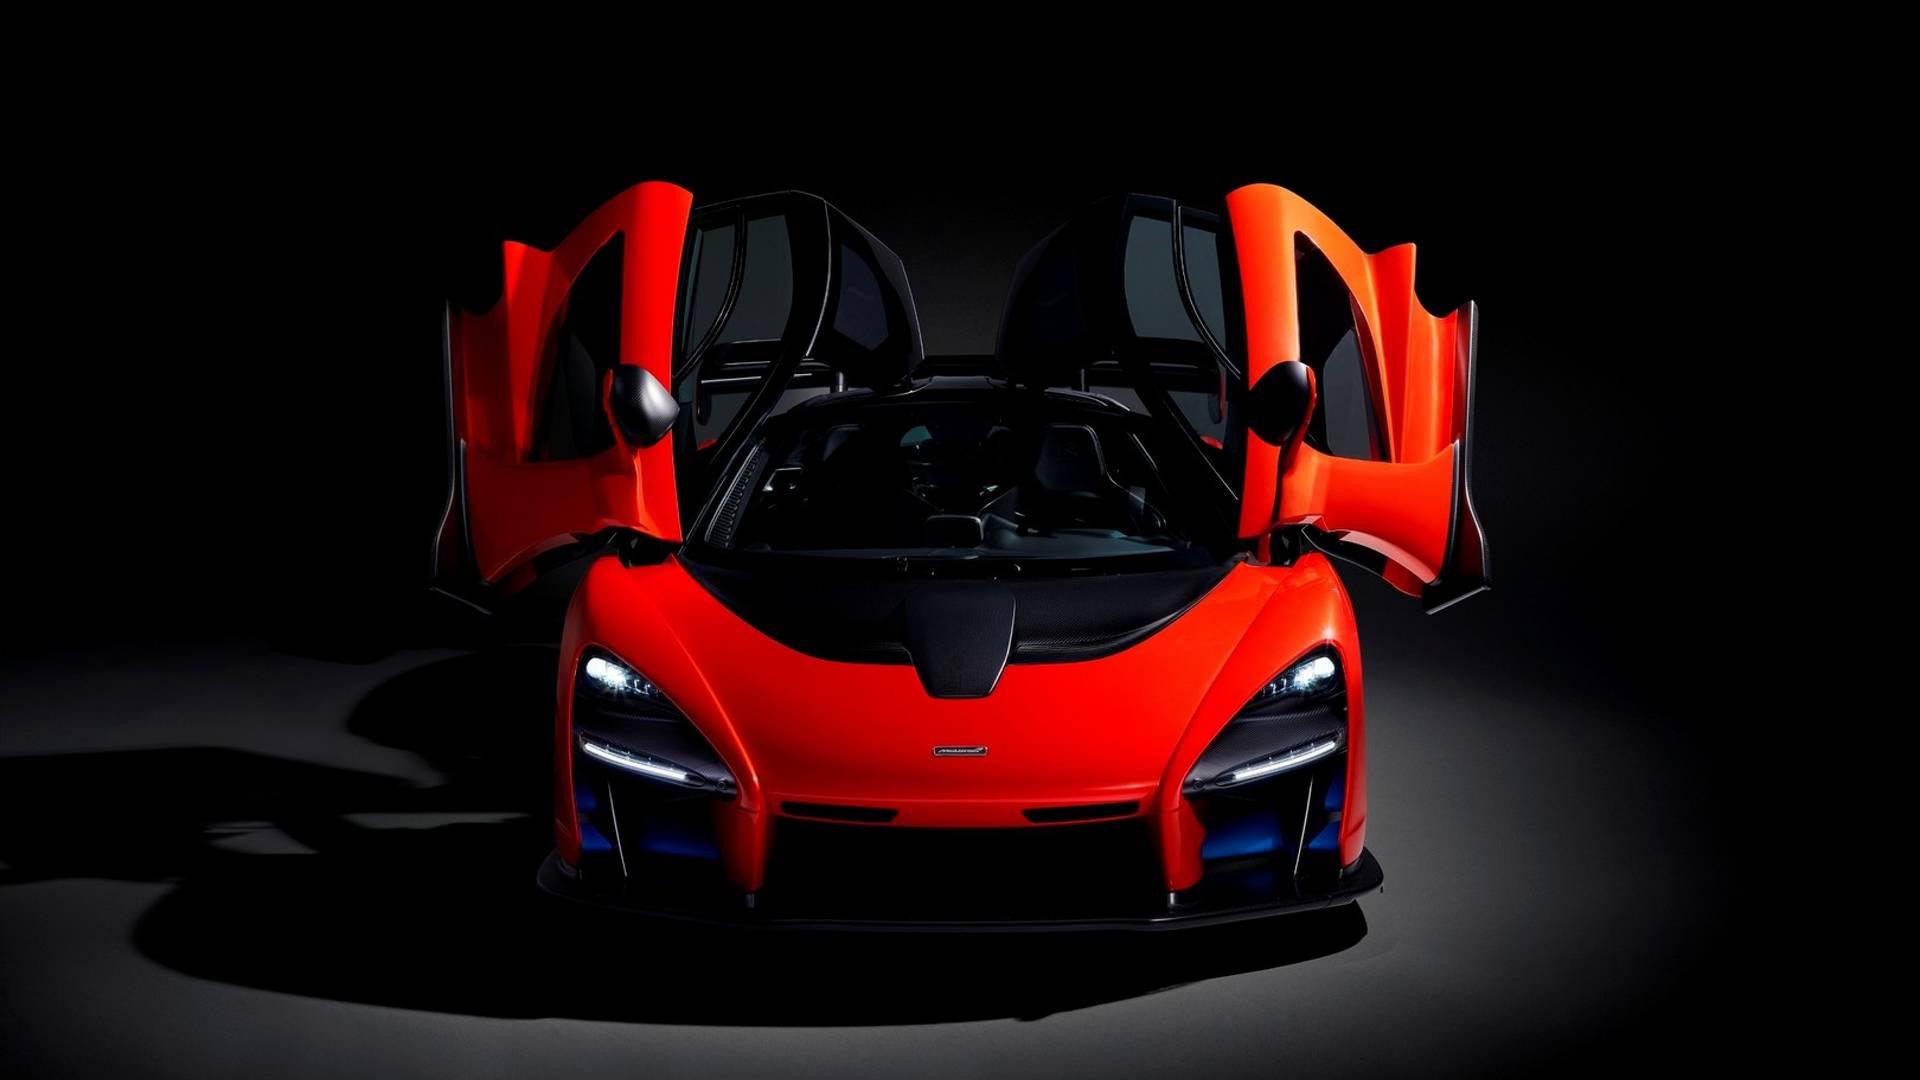 2018 Mclaren P1 Price >> New McLaren Senna (P15) Sacrifices Good Looks For Ultimate Performance - autoevolution